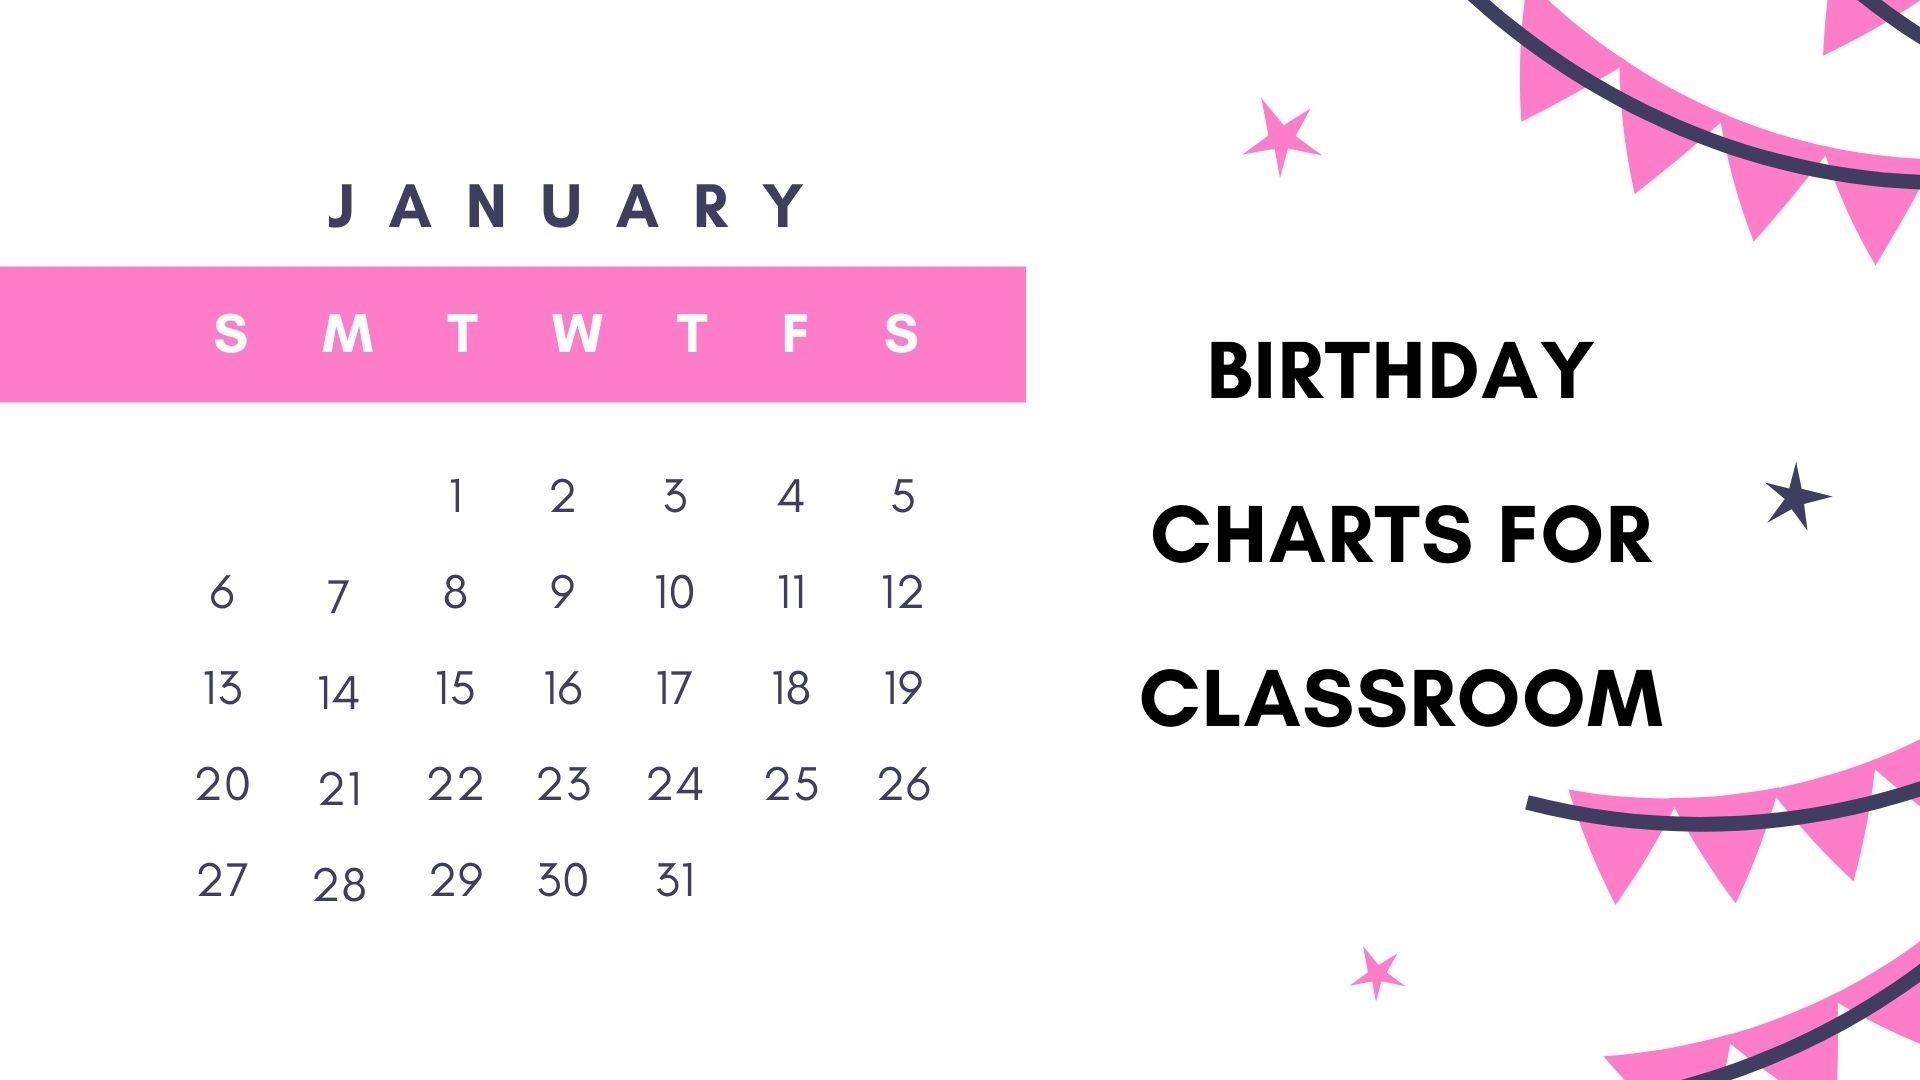 Birthday Charts for Classroom